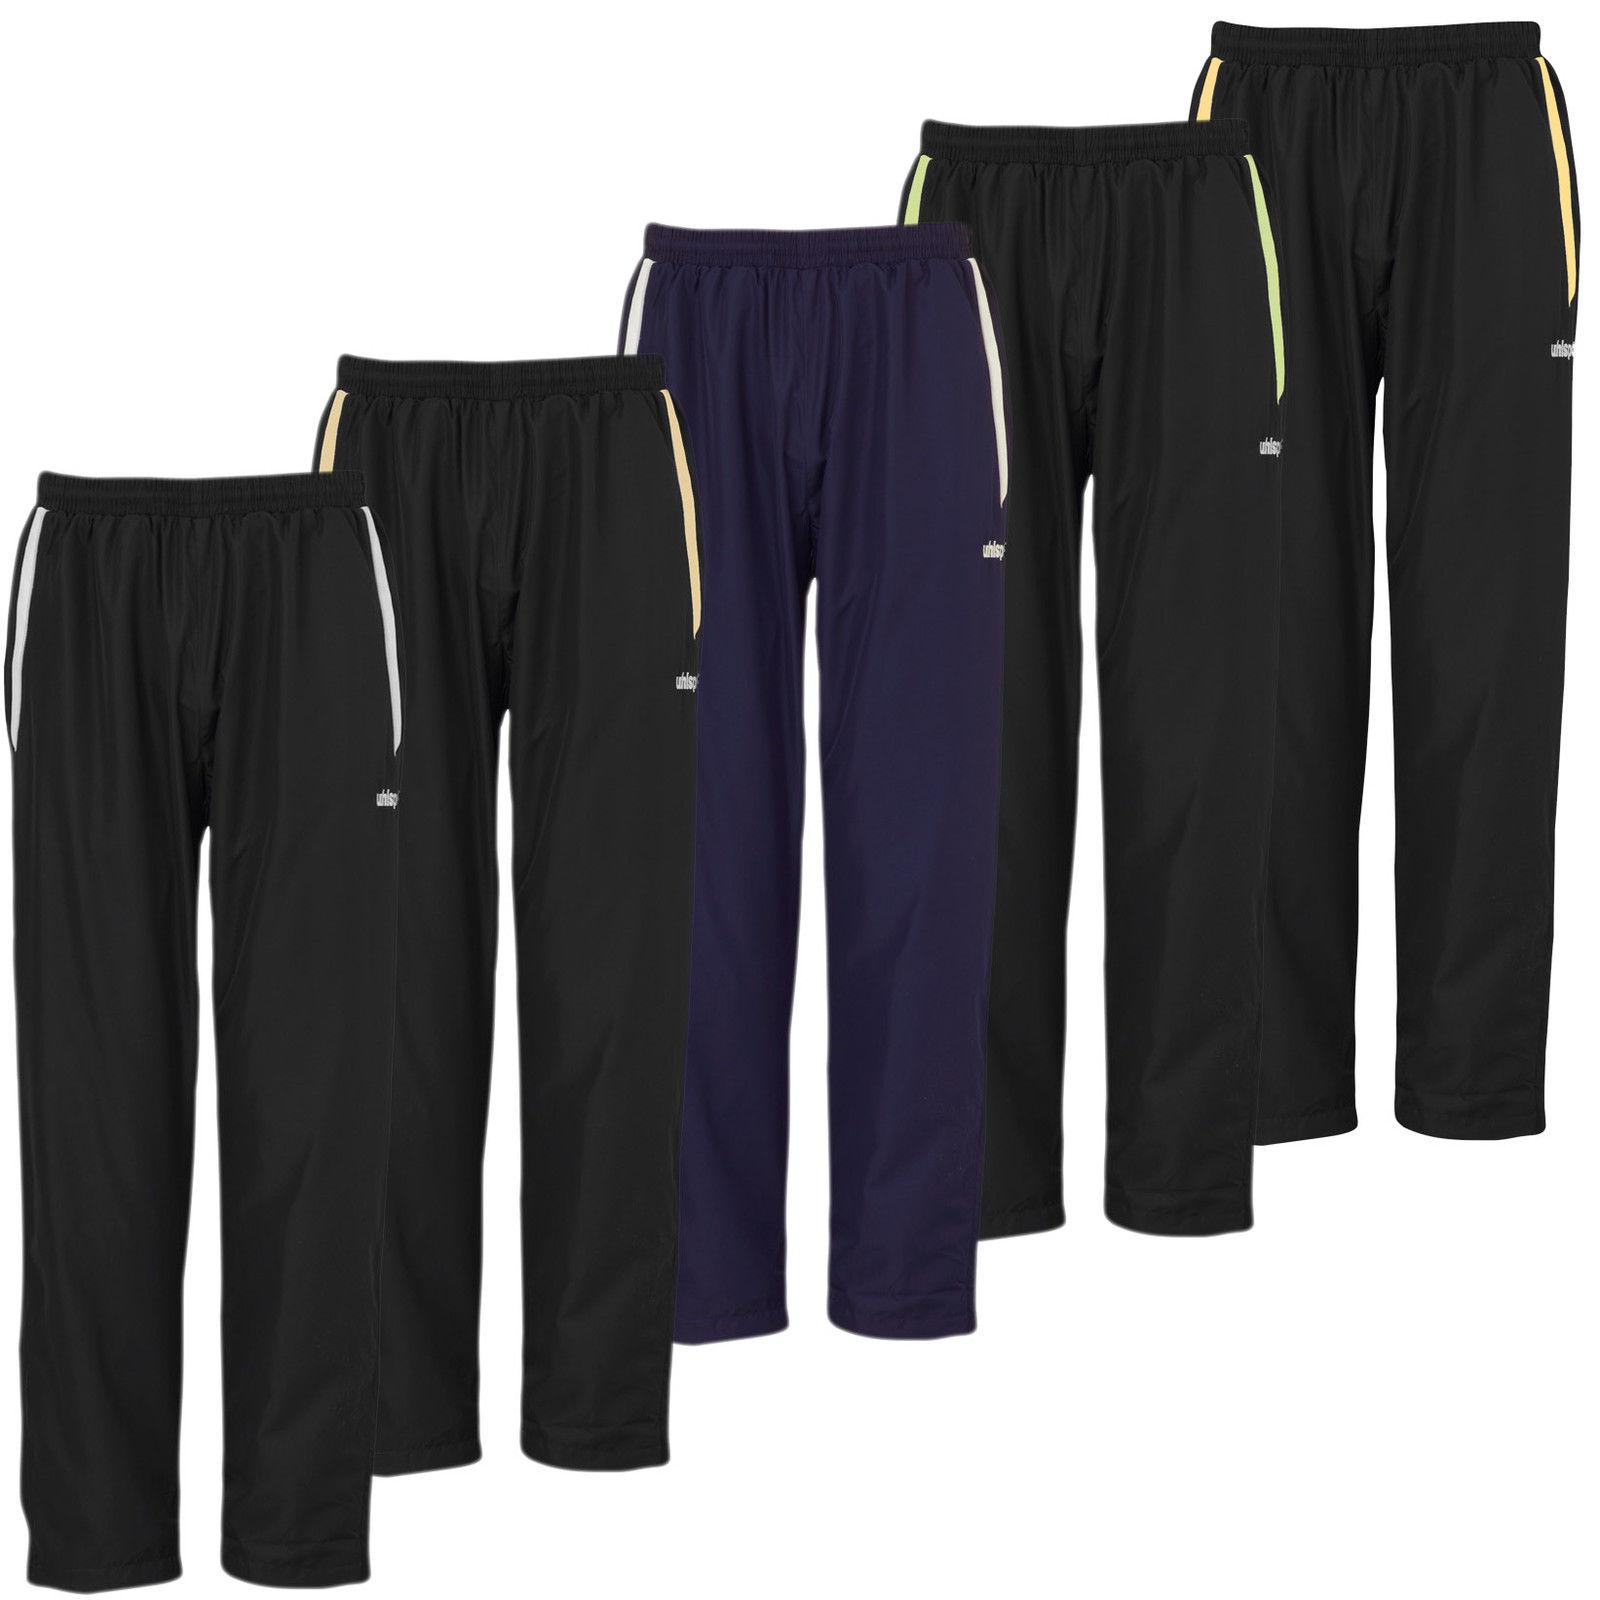 Uhlsport TEAM Woven Pant Polyesterhose Sporthose Hose lang Fußballhose Anzughose